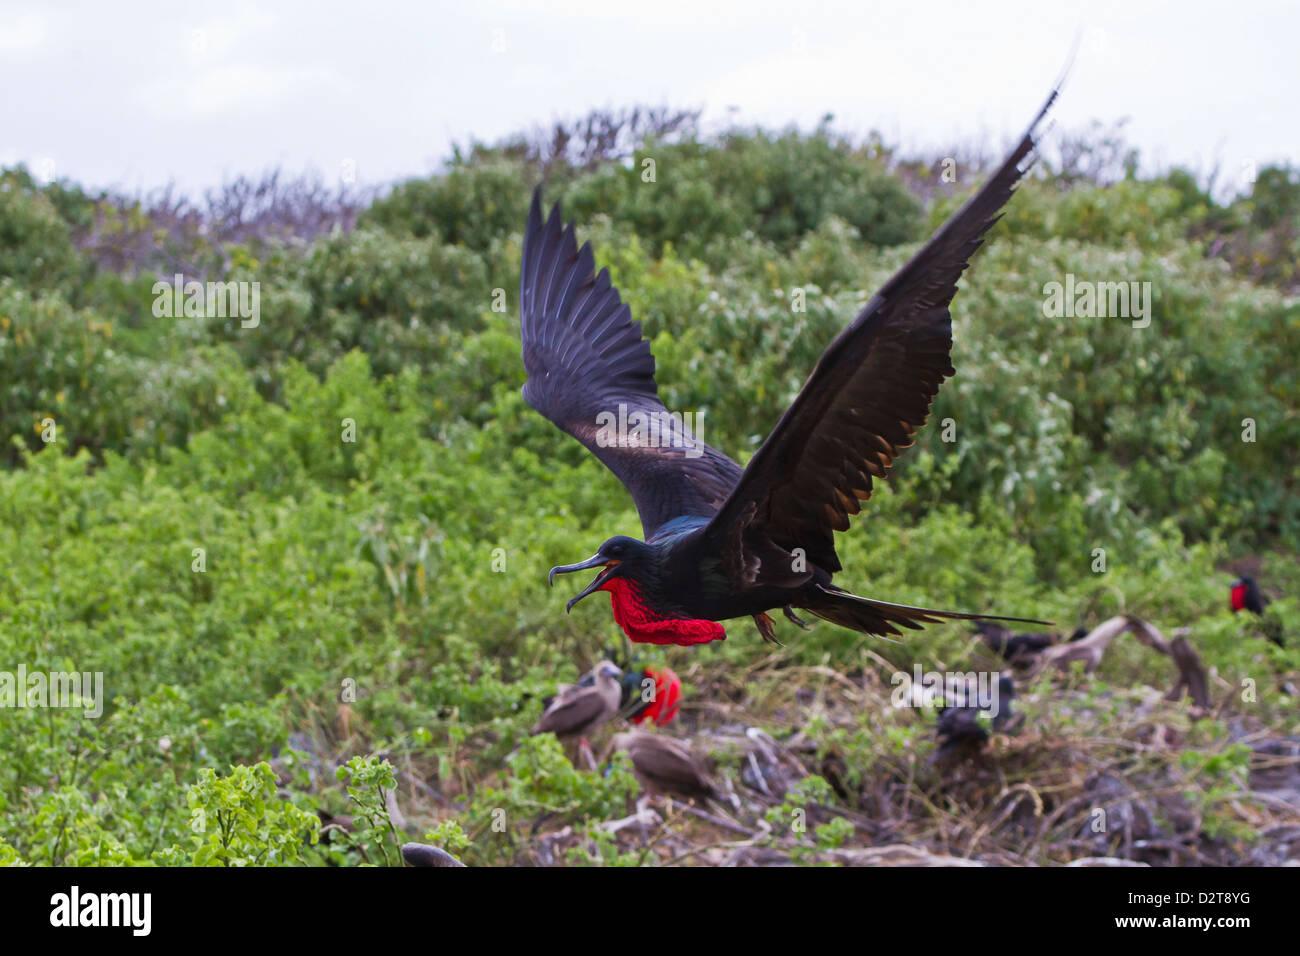 Adult male great frigatebirds (Fregata minor), Genovesa Island, Galapagos Islands, Ecuador - Stock Image